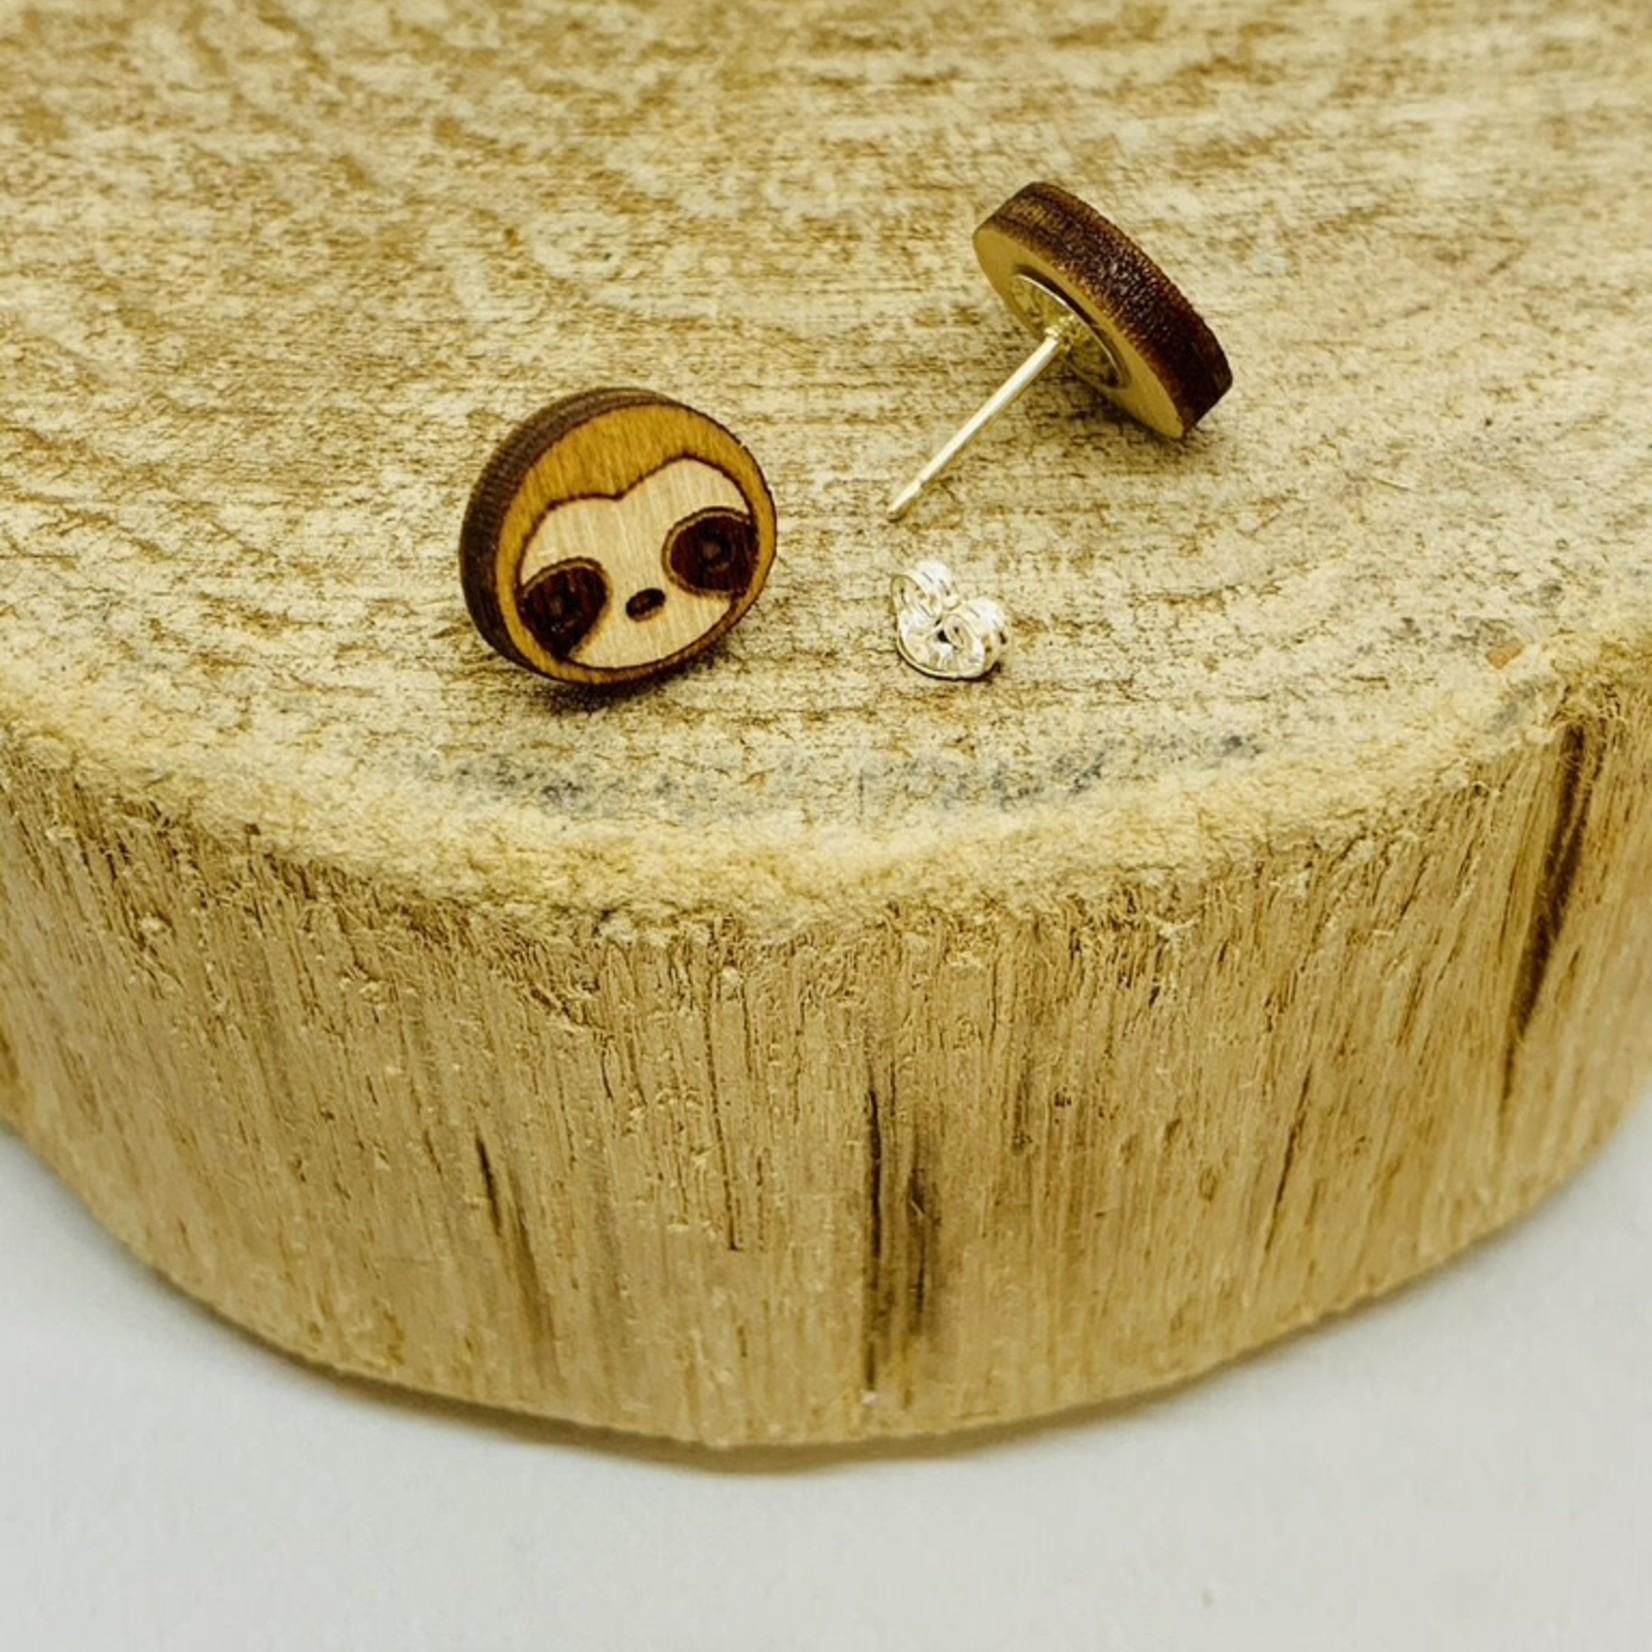 Handmade sloth Lasercut Wood Earrings on Sterling Silver Posts